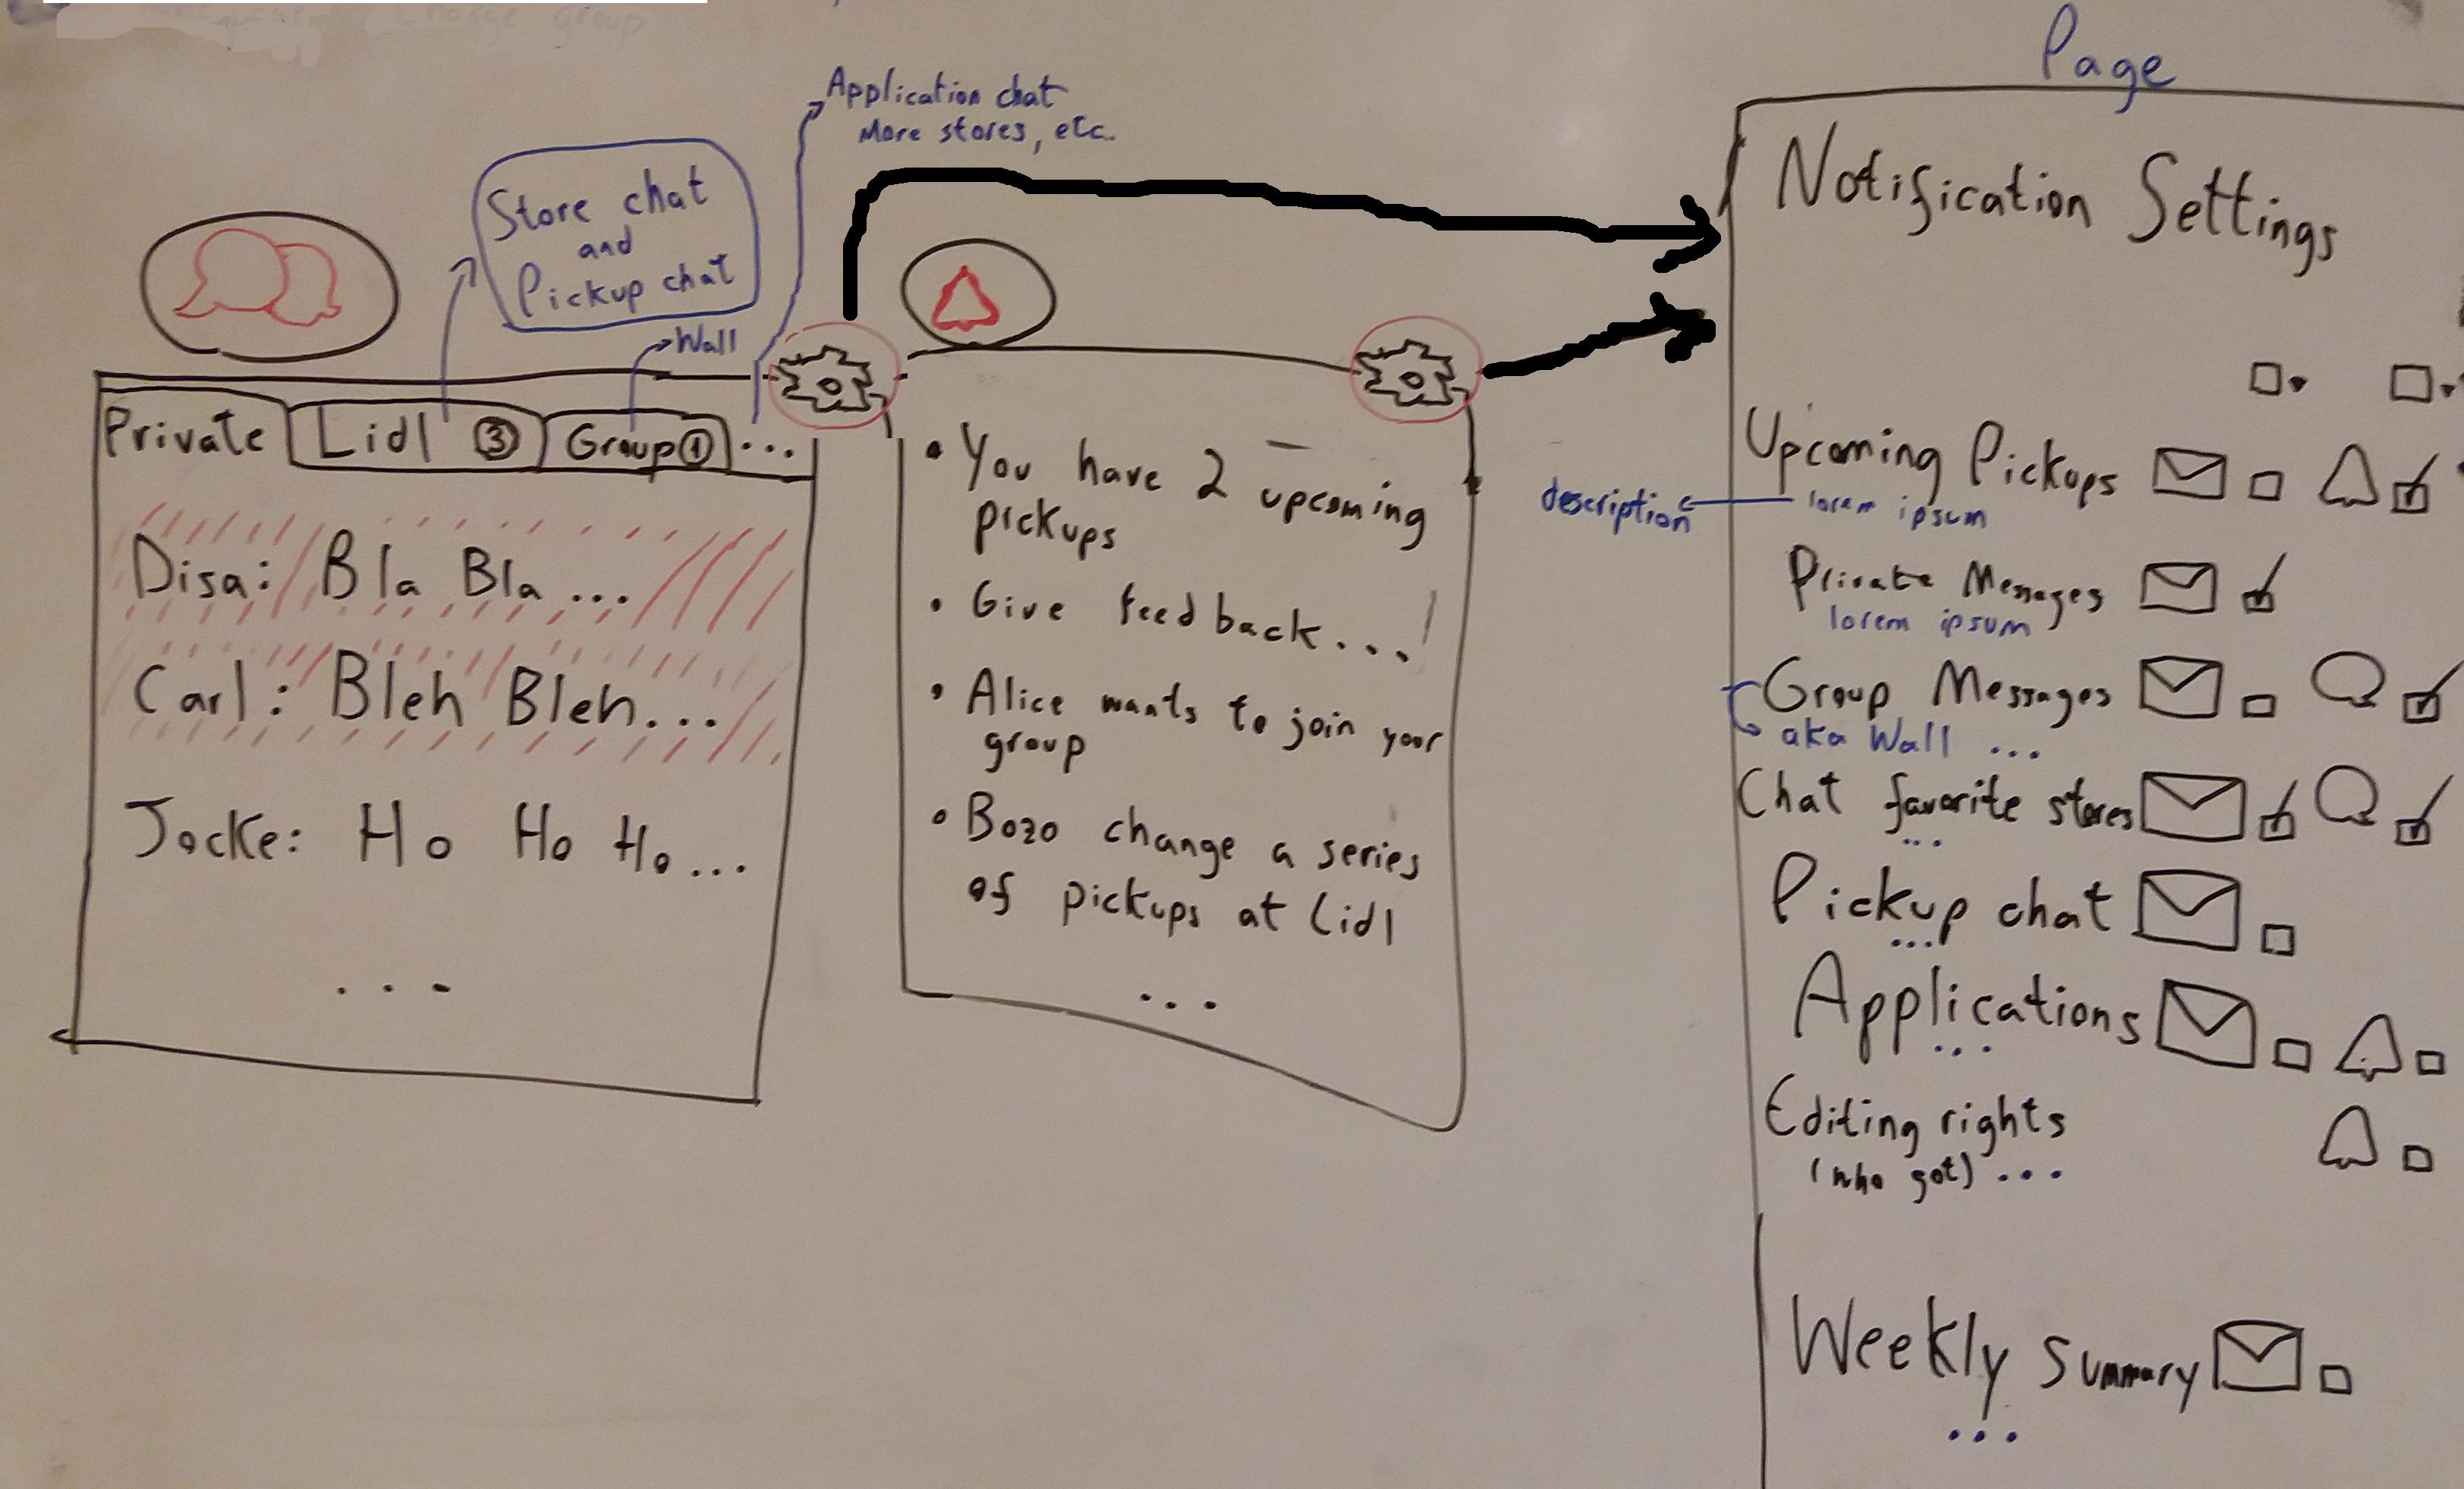 Improving notifications and UX (draft) - Karrot - Foodsaving